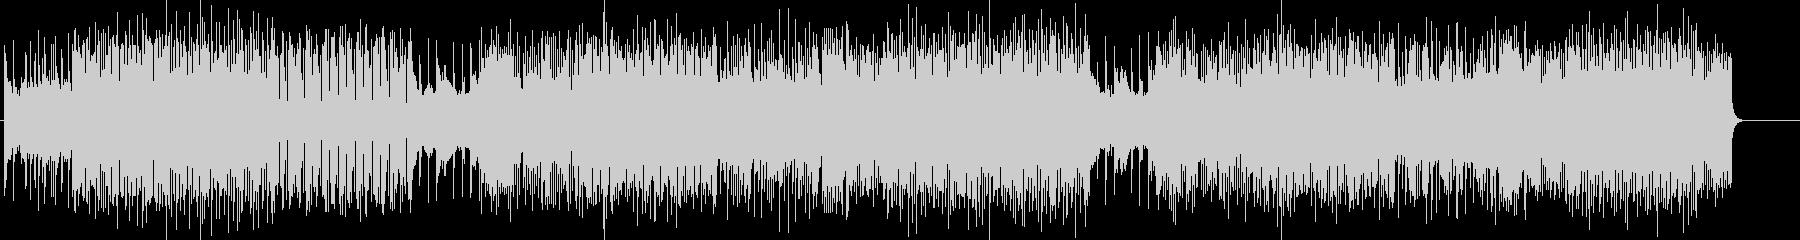 DARK・HARDROCK BGM286の未再生の波形